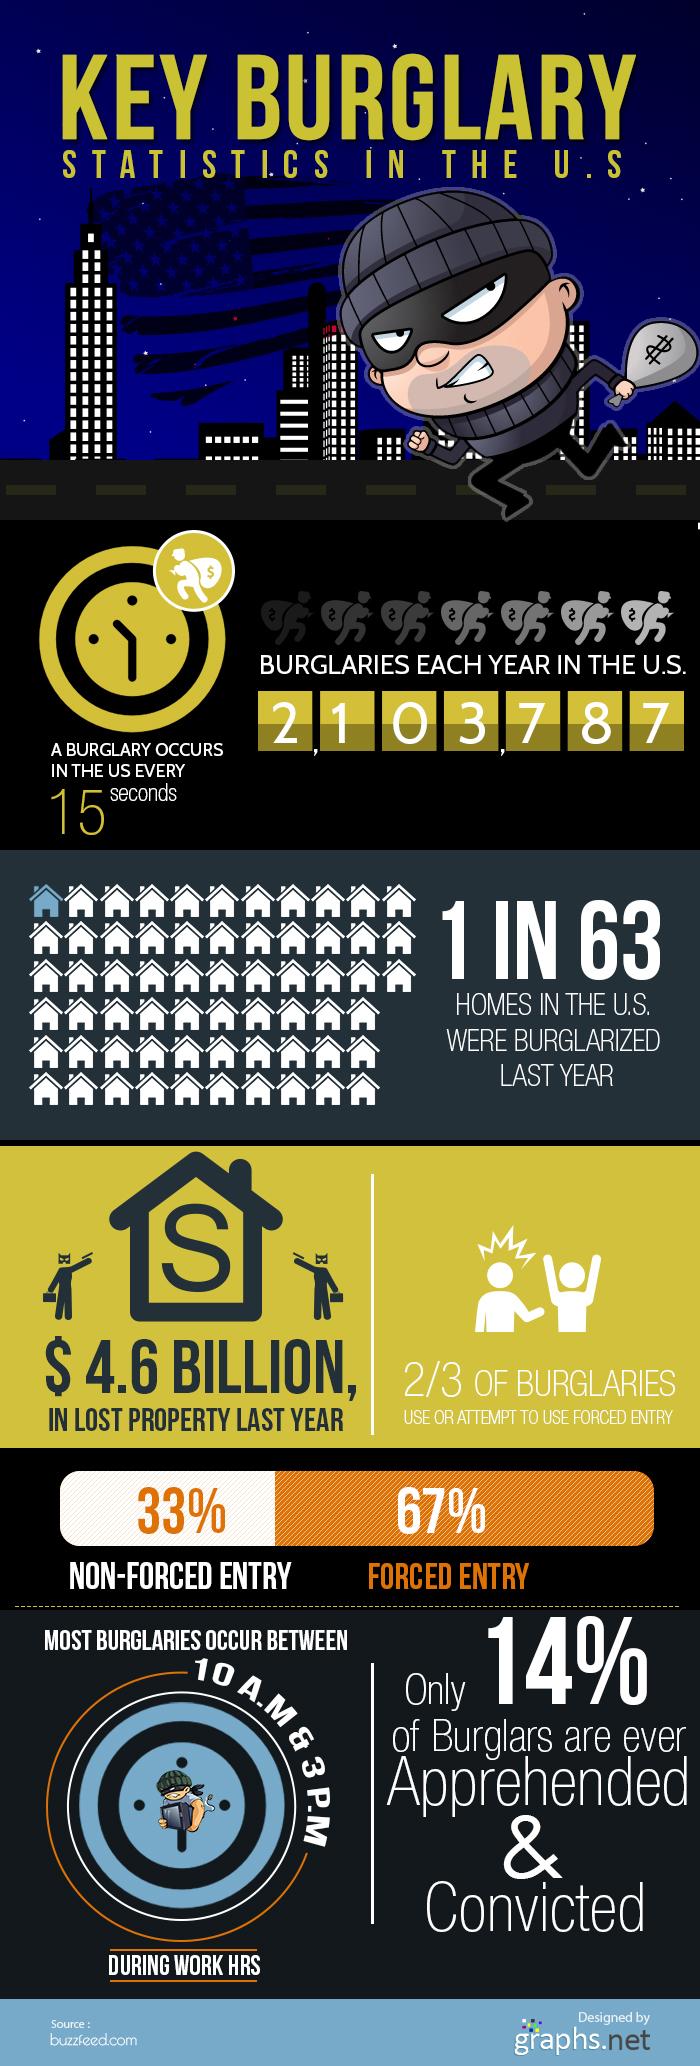 Key Burglary statistics in the us